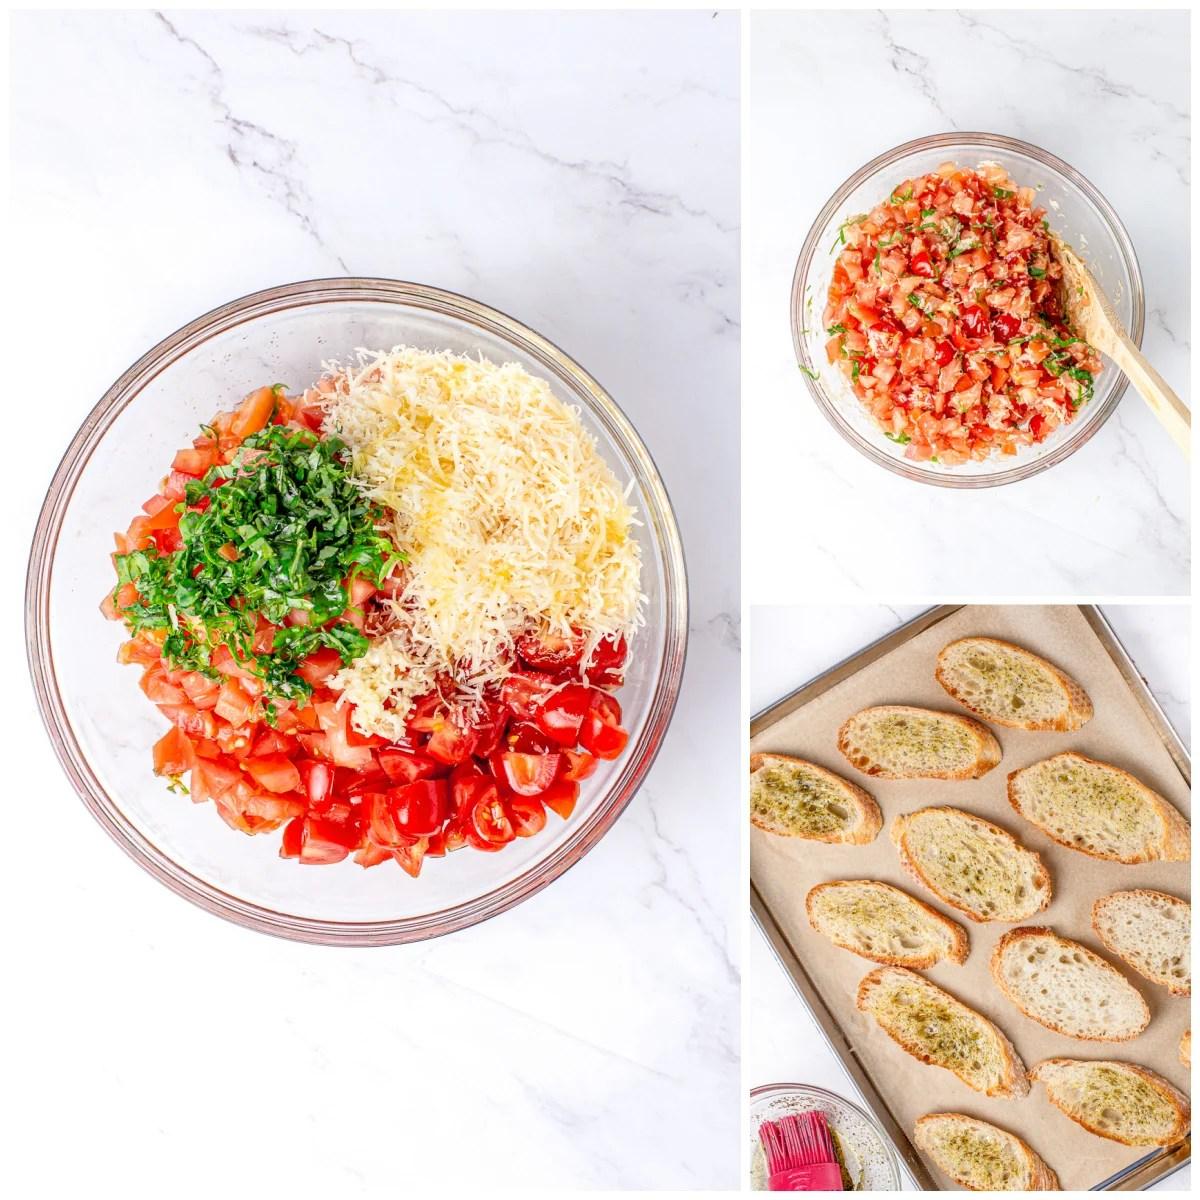 Step by step photos on how to make Bruschetta with Garlic Crostini